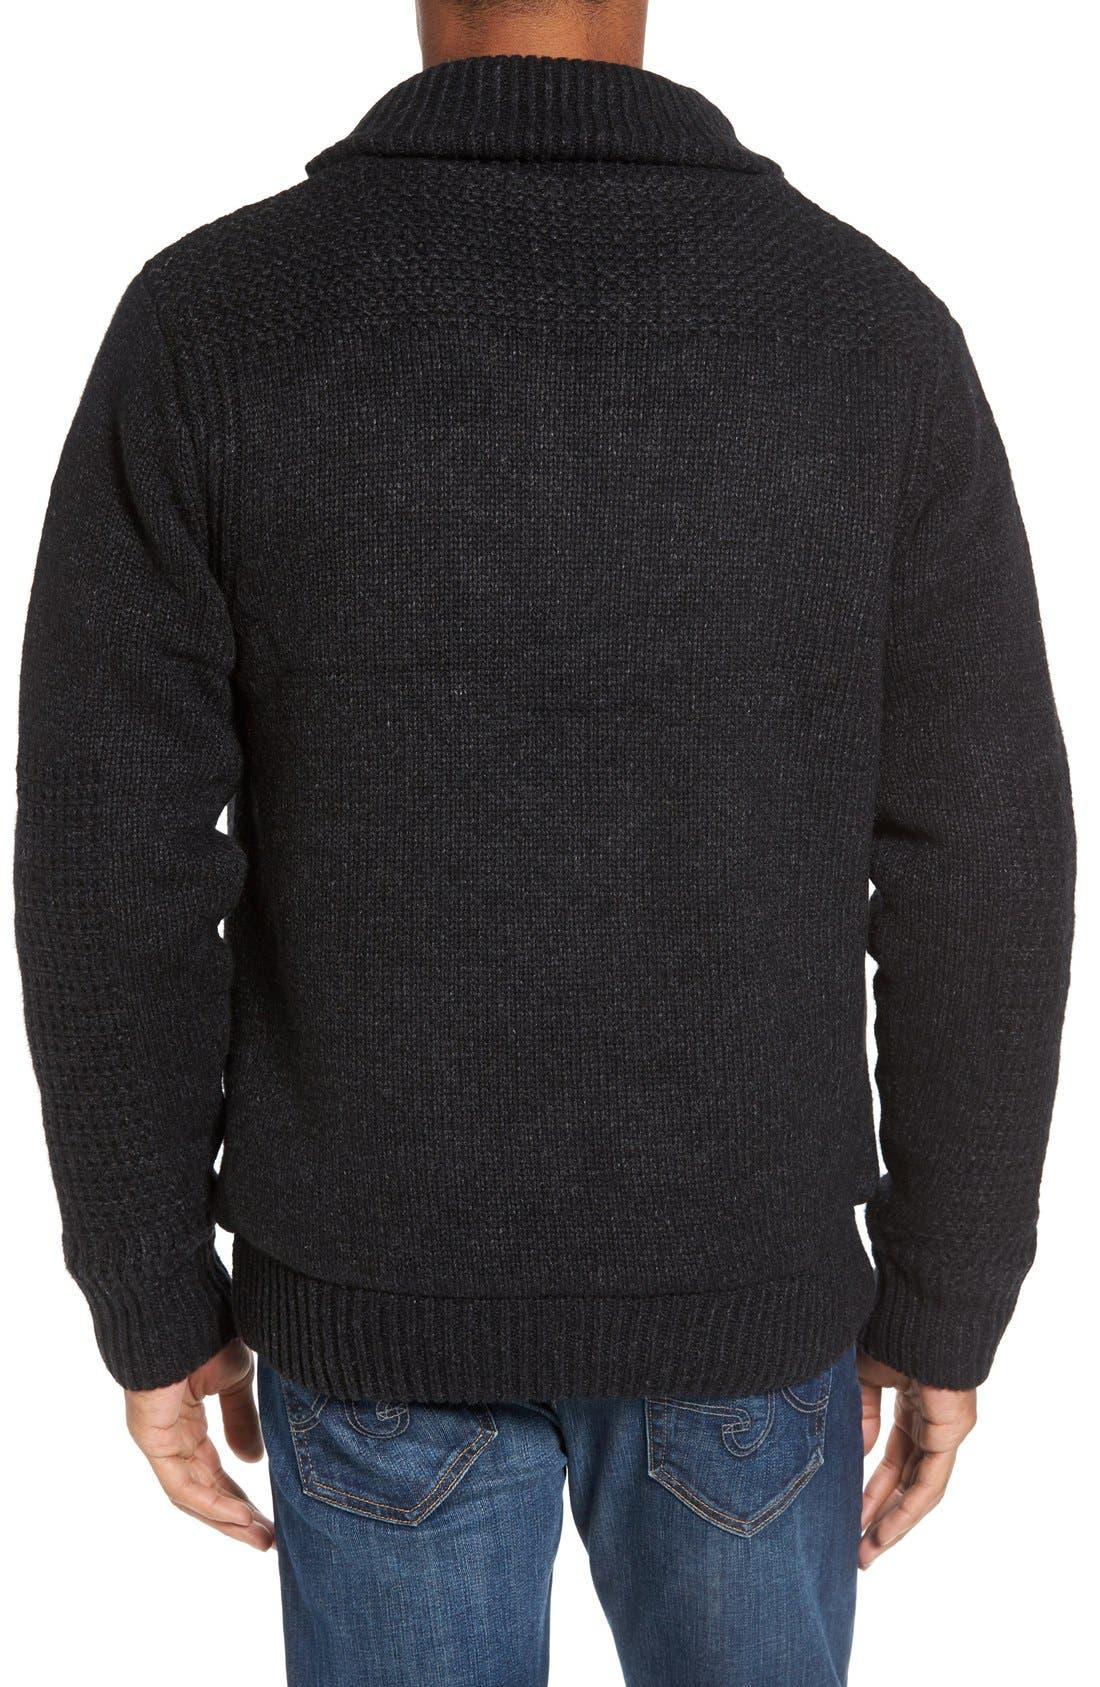 SCHOTT NYC,                             Lined Wool Zip Sweater,                             Alternate thumbnail 9, color,                             BLACK